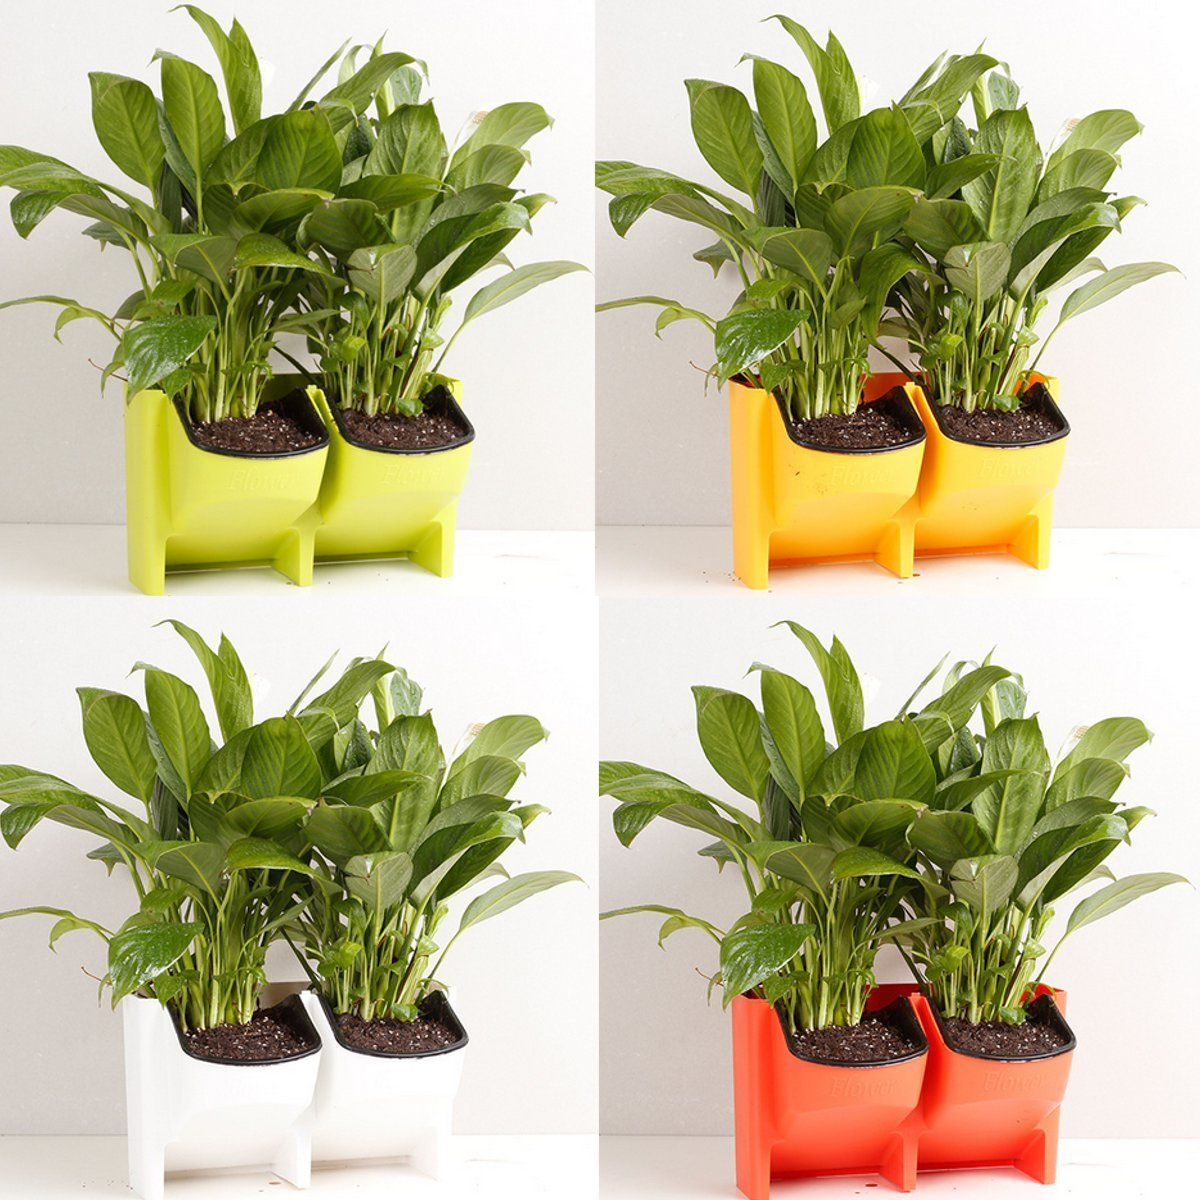 2-Pocket Vertical Wall Planter Self Watering Hanging Flower Pot ...